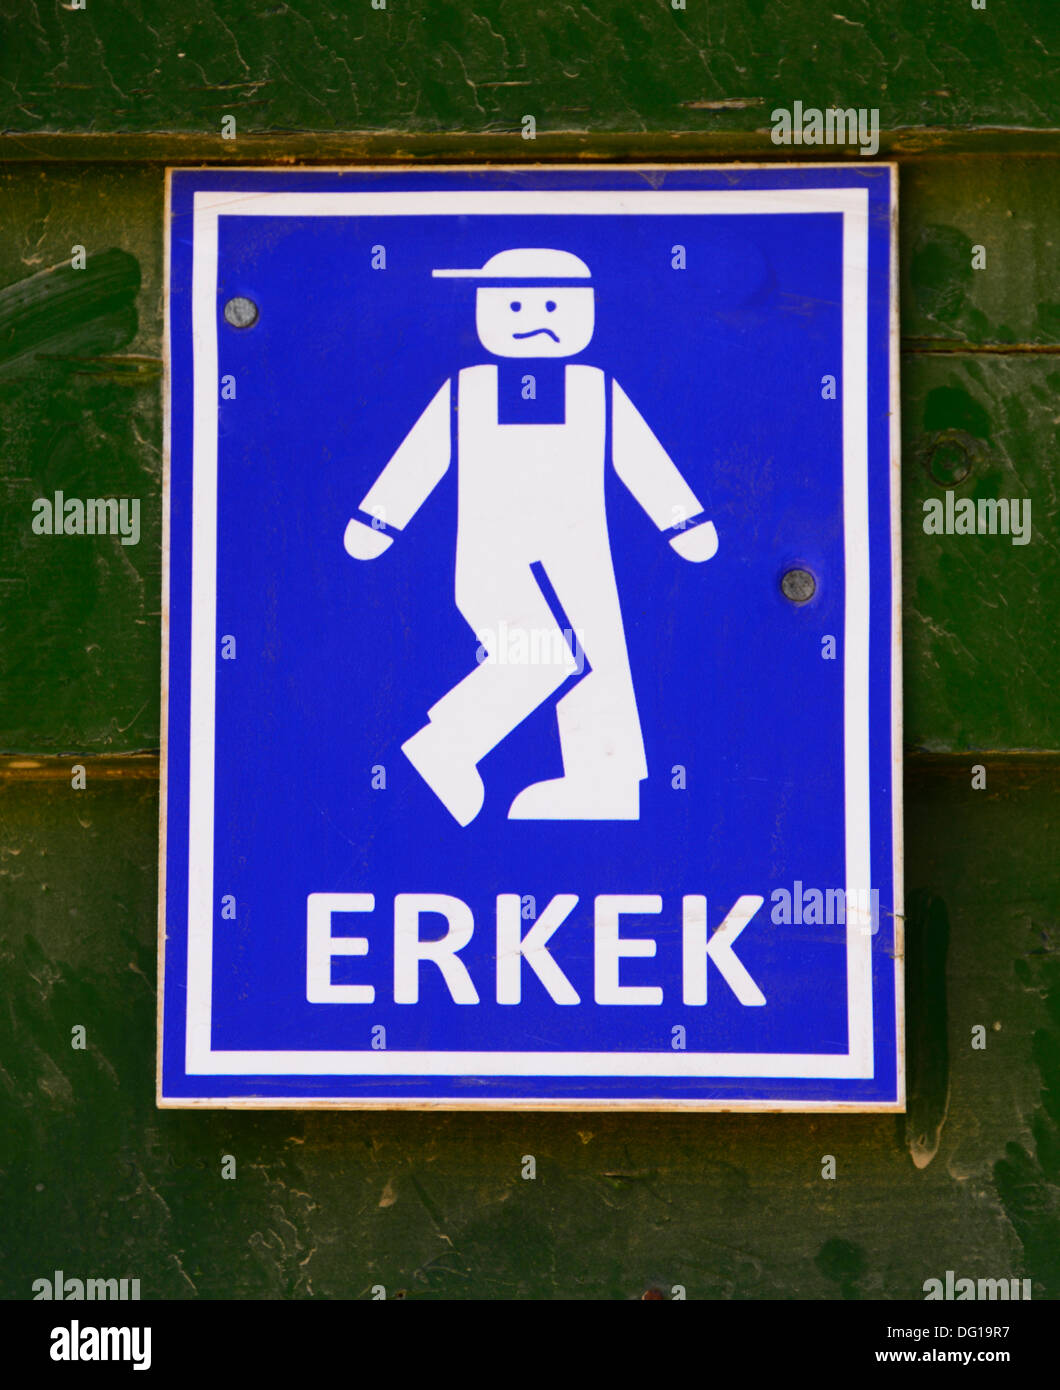 Humorous men's lavatory sign in Turkish. - Stock Image